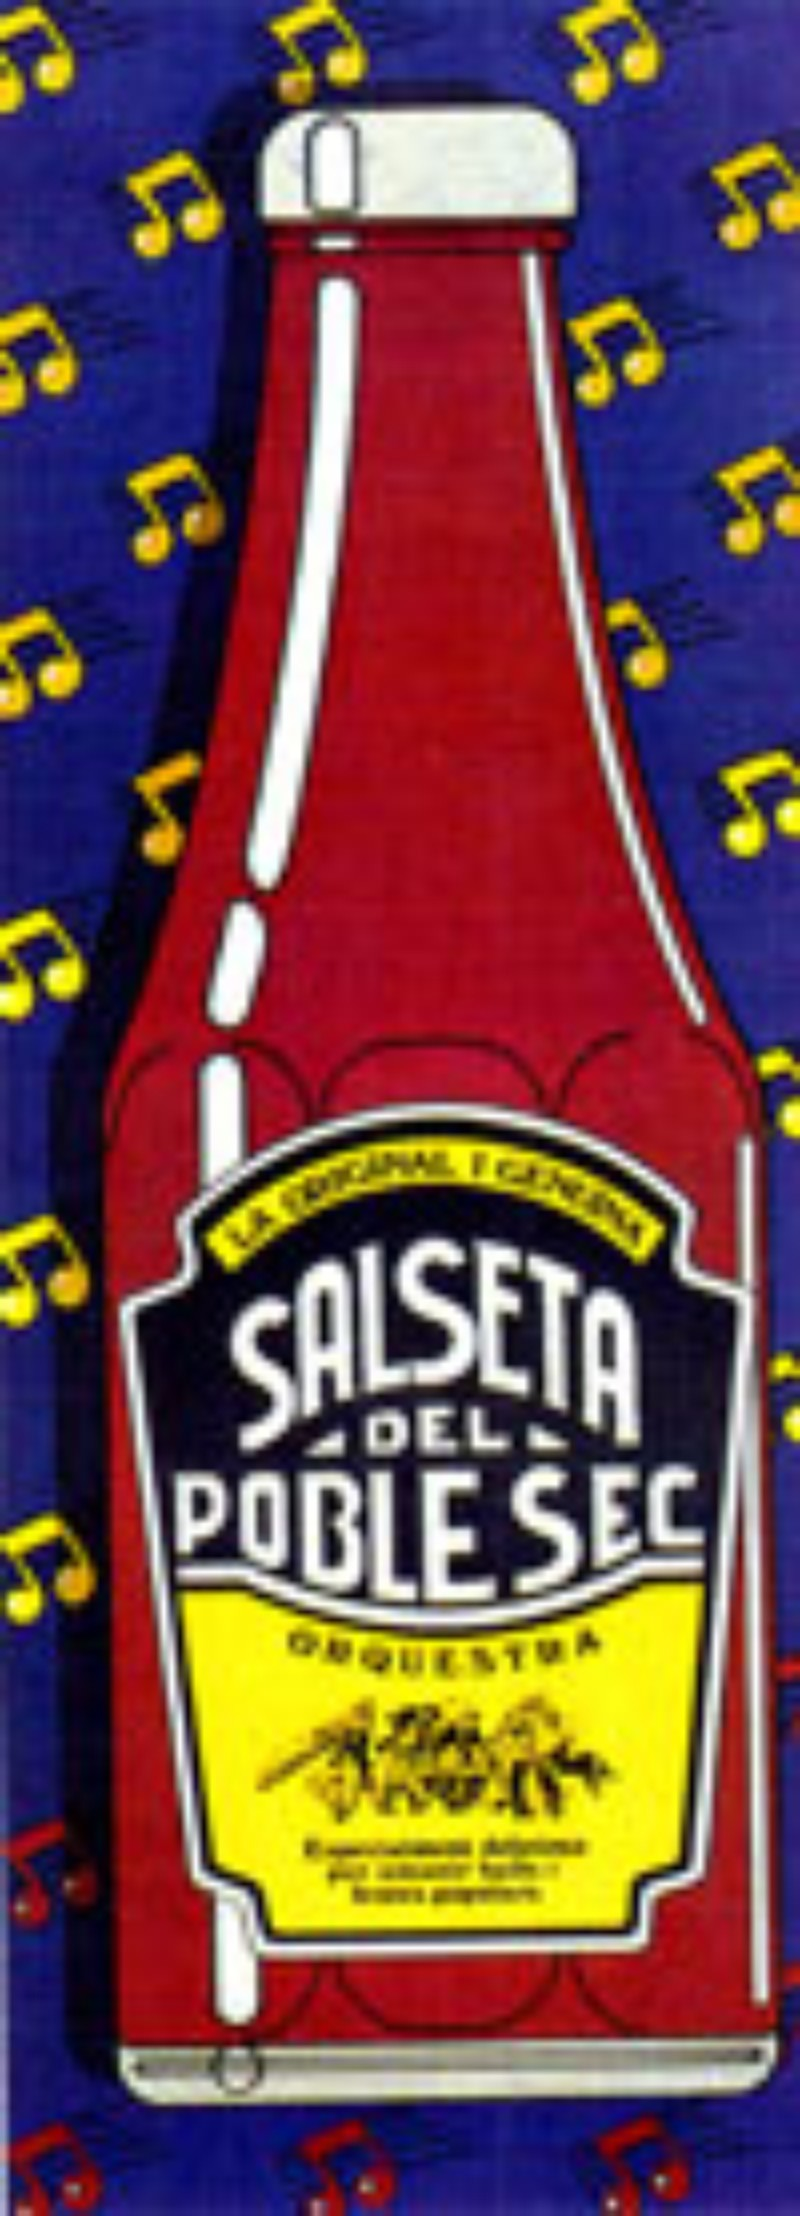 Logo de La Salseta del Poble Sec